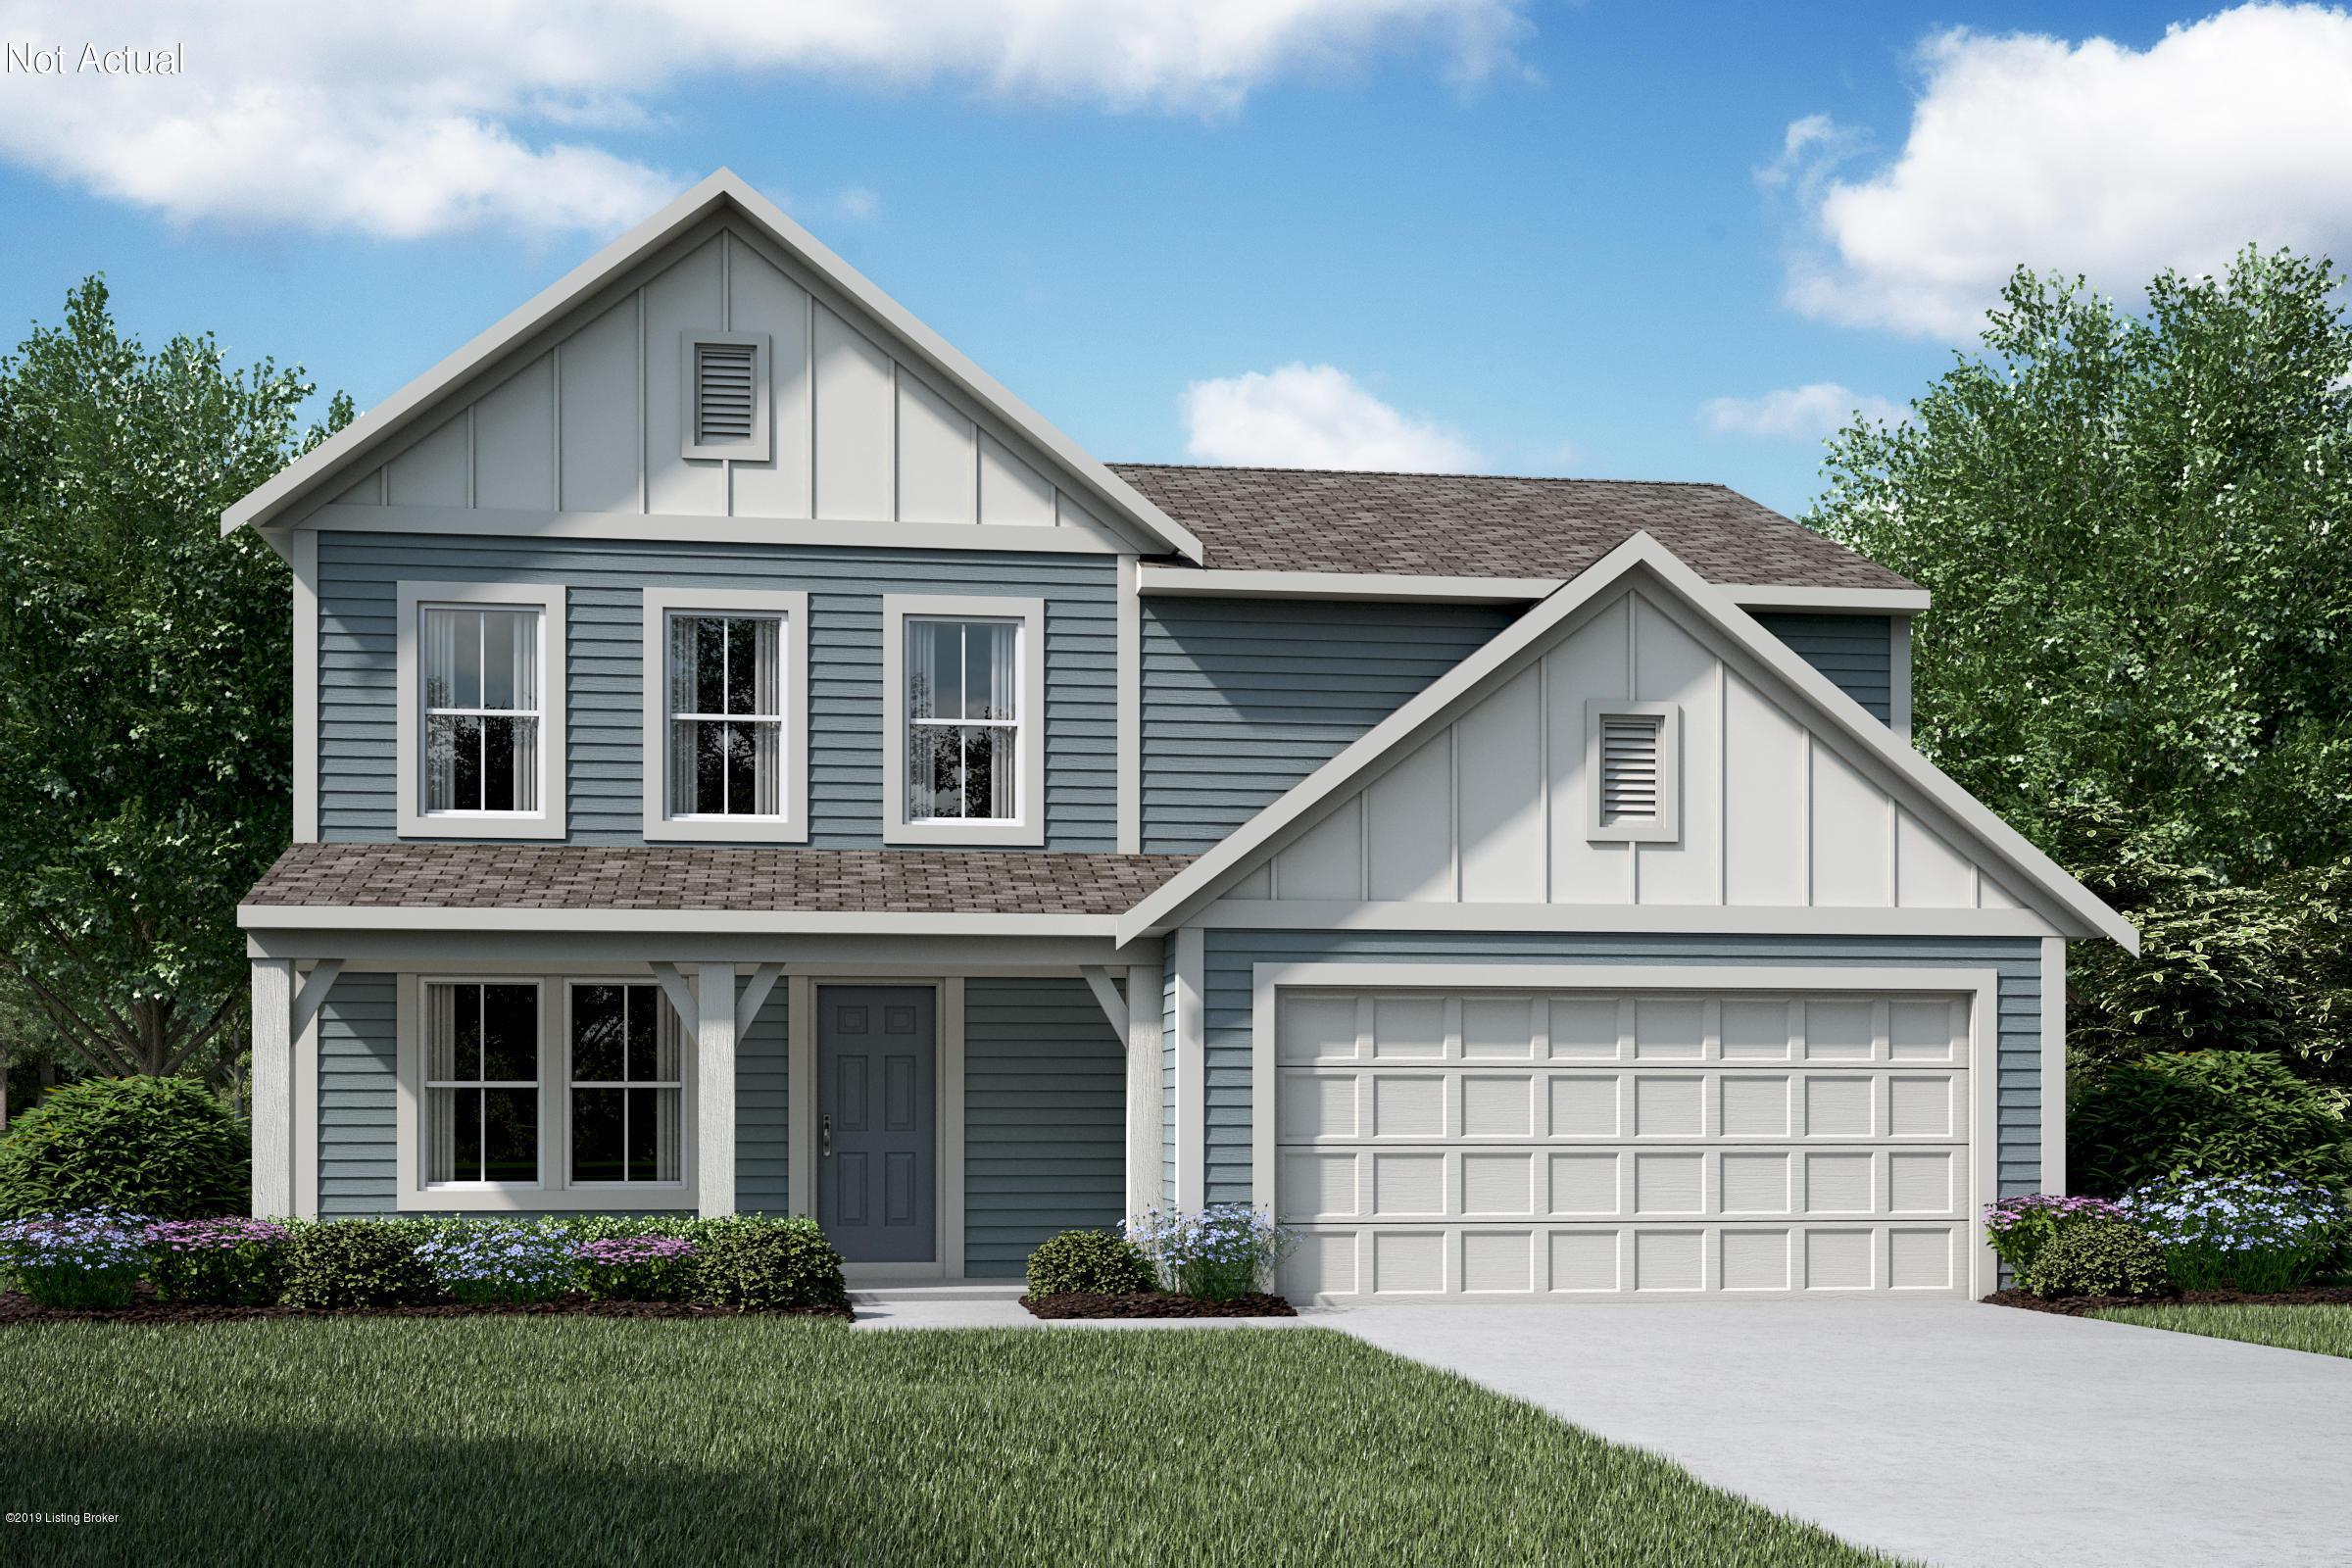 115 Ledgestone Ct, Shepherdsville, Kentucky 40165, 3 Bedrooms Bedrooms, 8 Rooms Rooms,3 BathroomsBathrooms,Residential,For Sale,Ledgestone,1525503